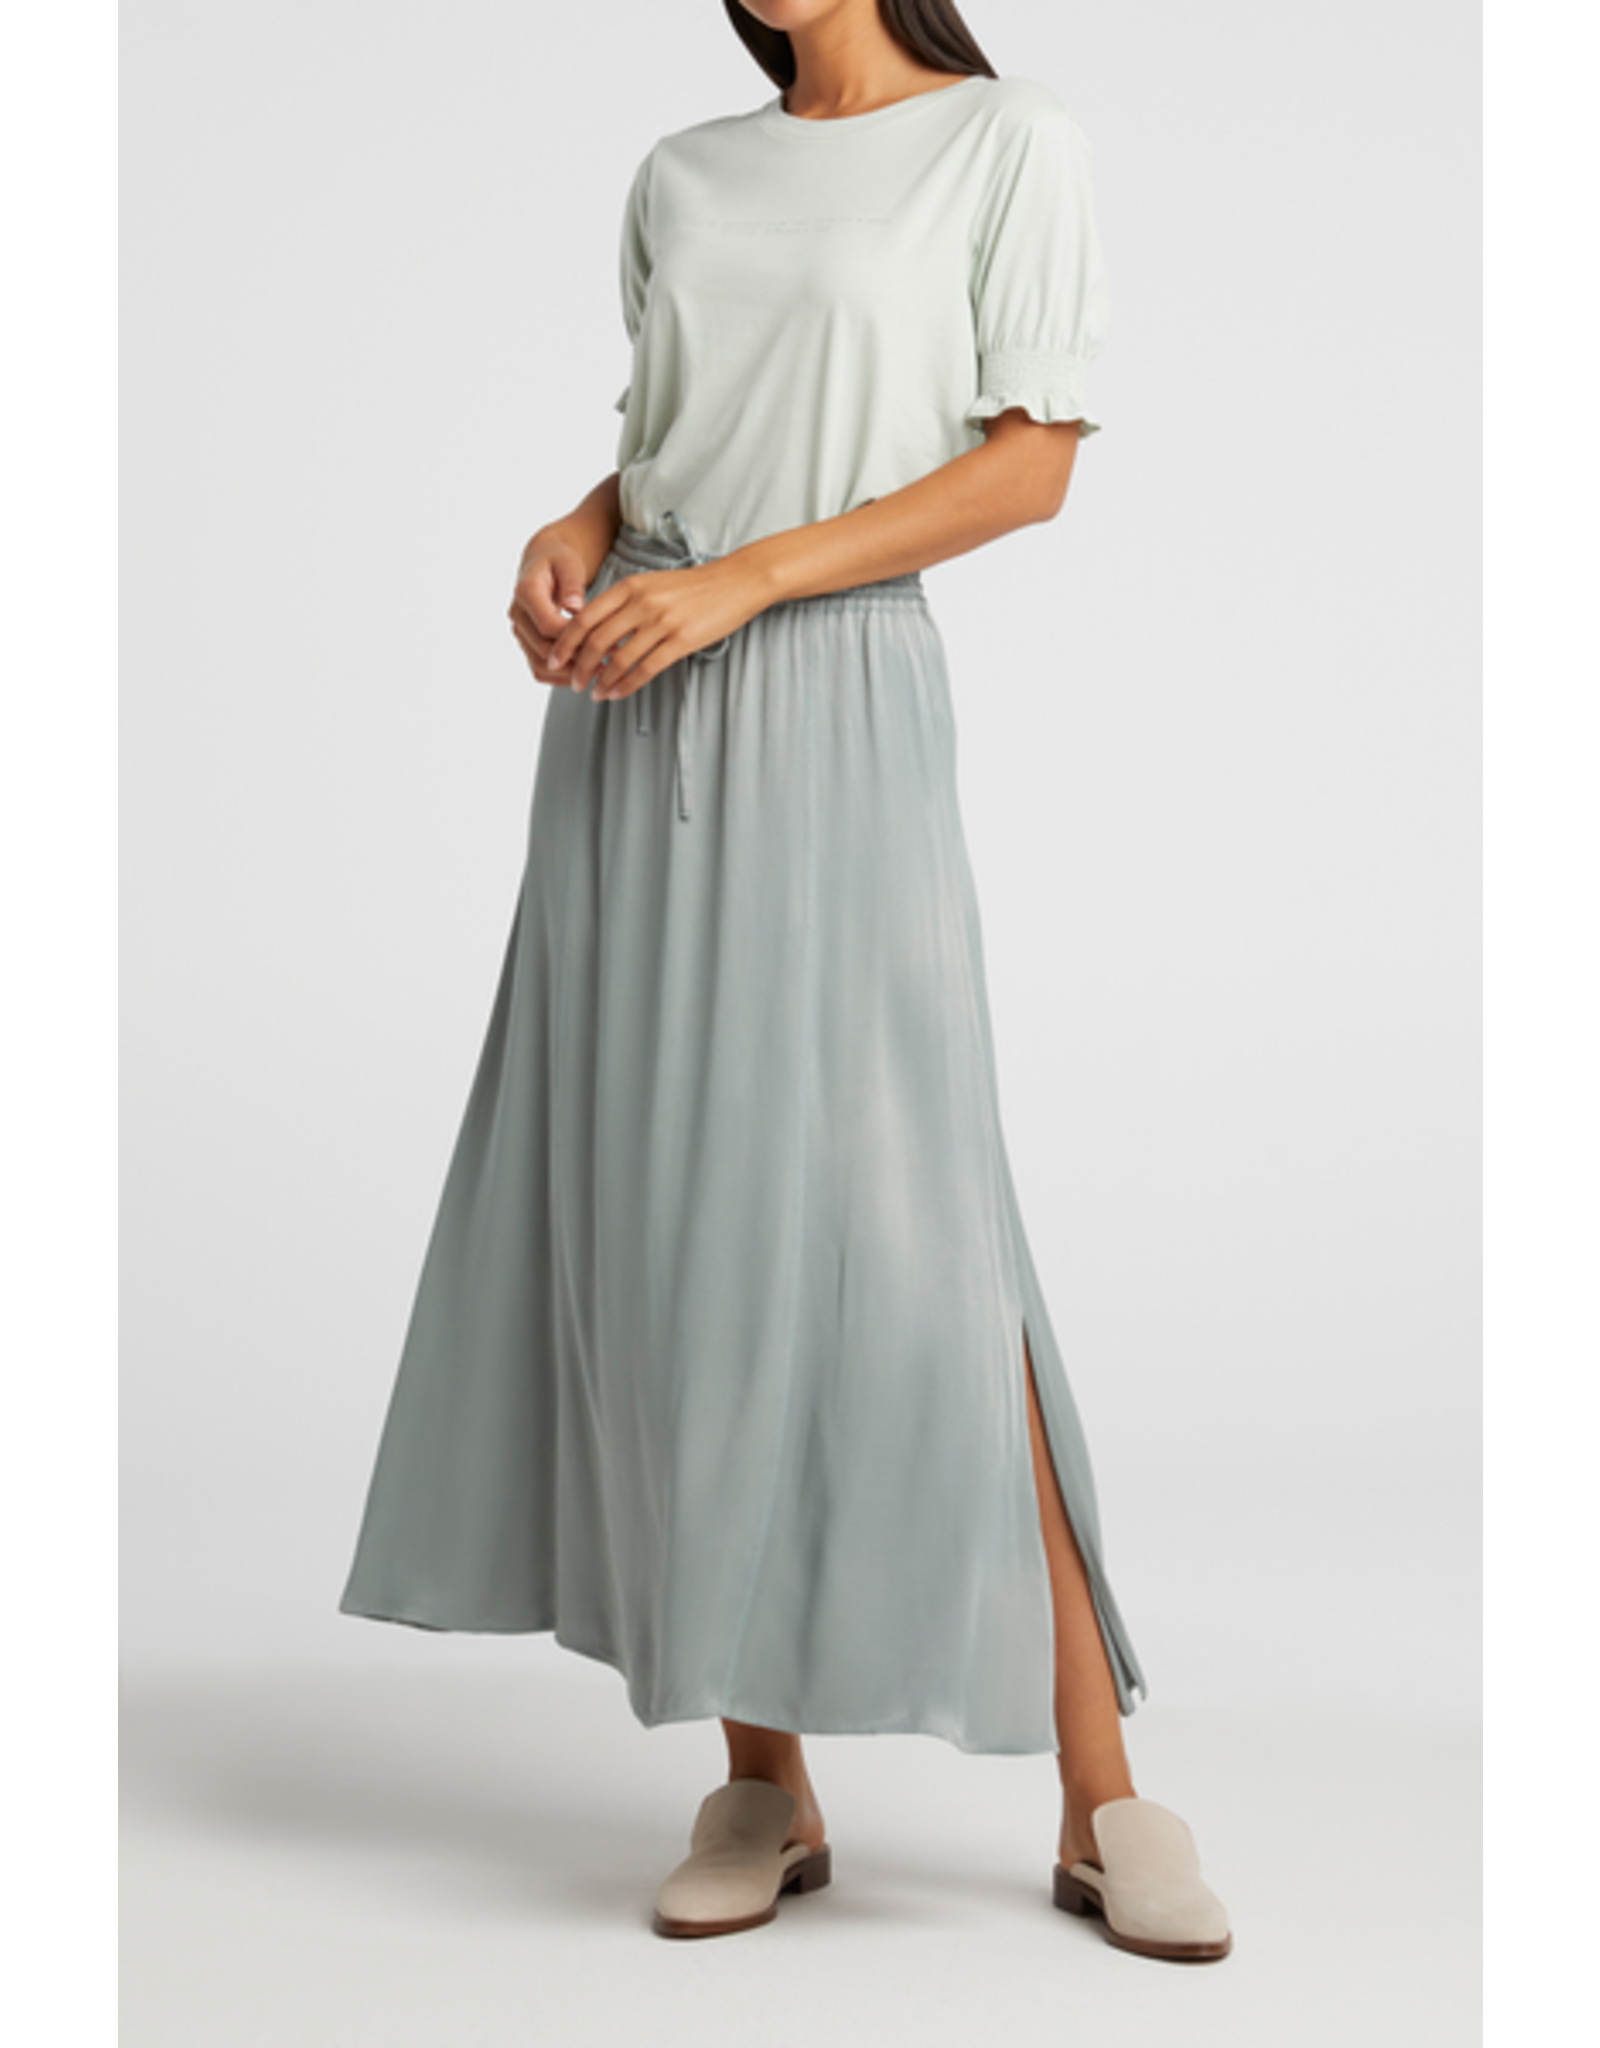 YAYA YAYA long satin skirt with elastic waist concrete blue